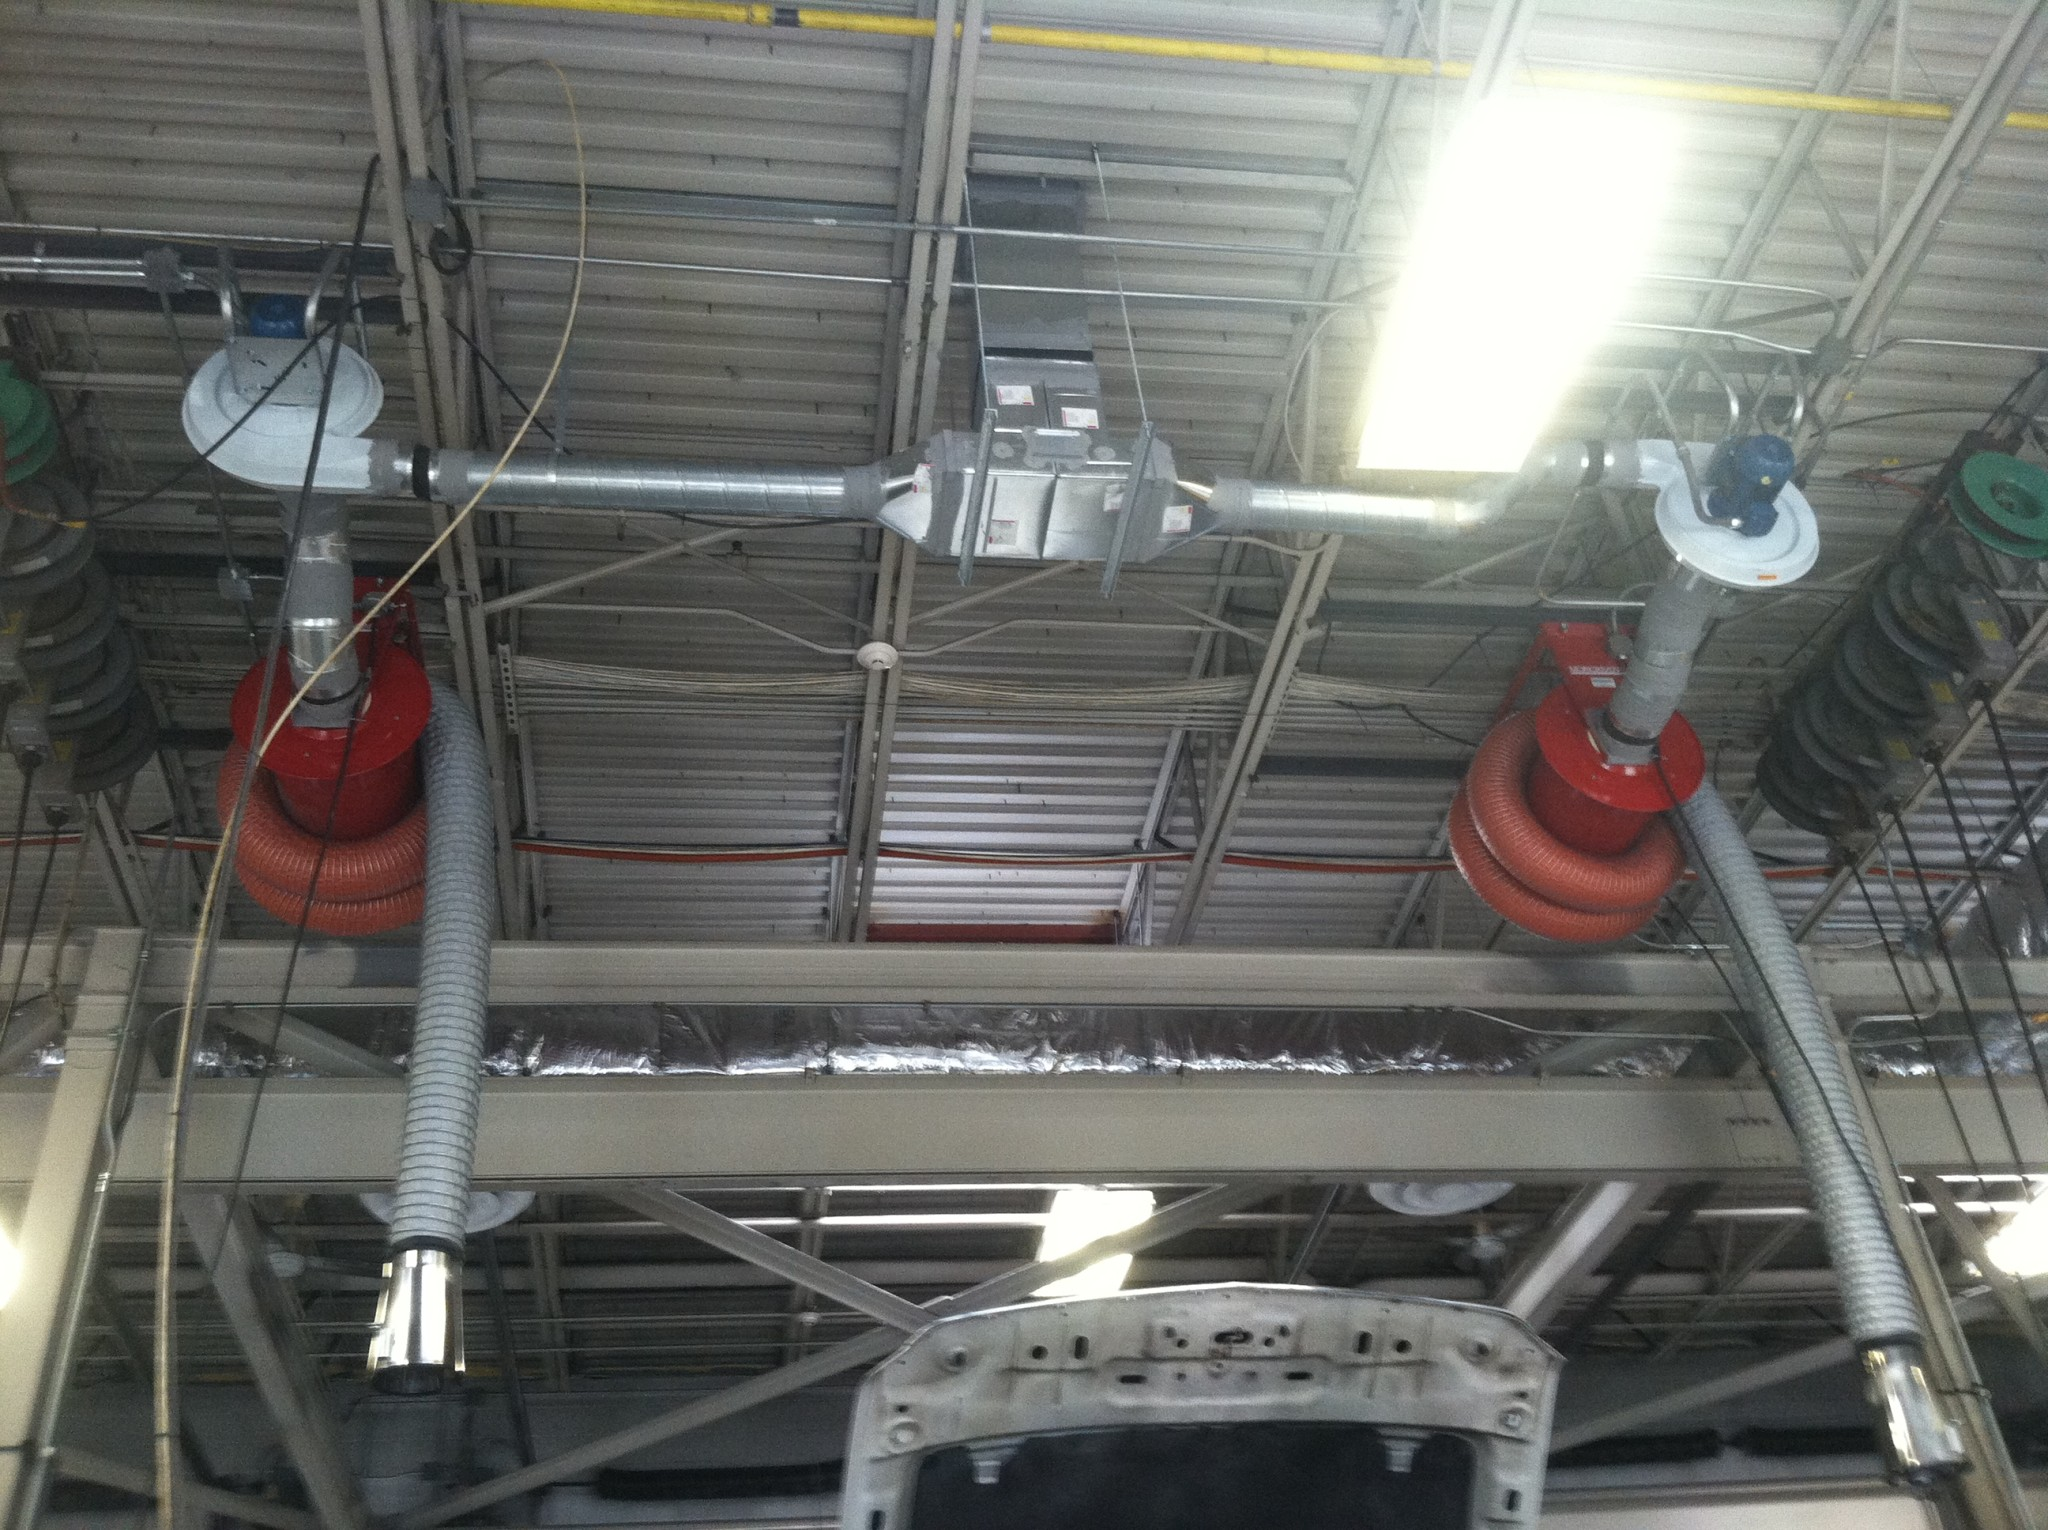 MDTA - Fort McHenry Tunnel - HVAC Upgrades